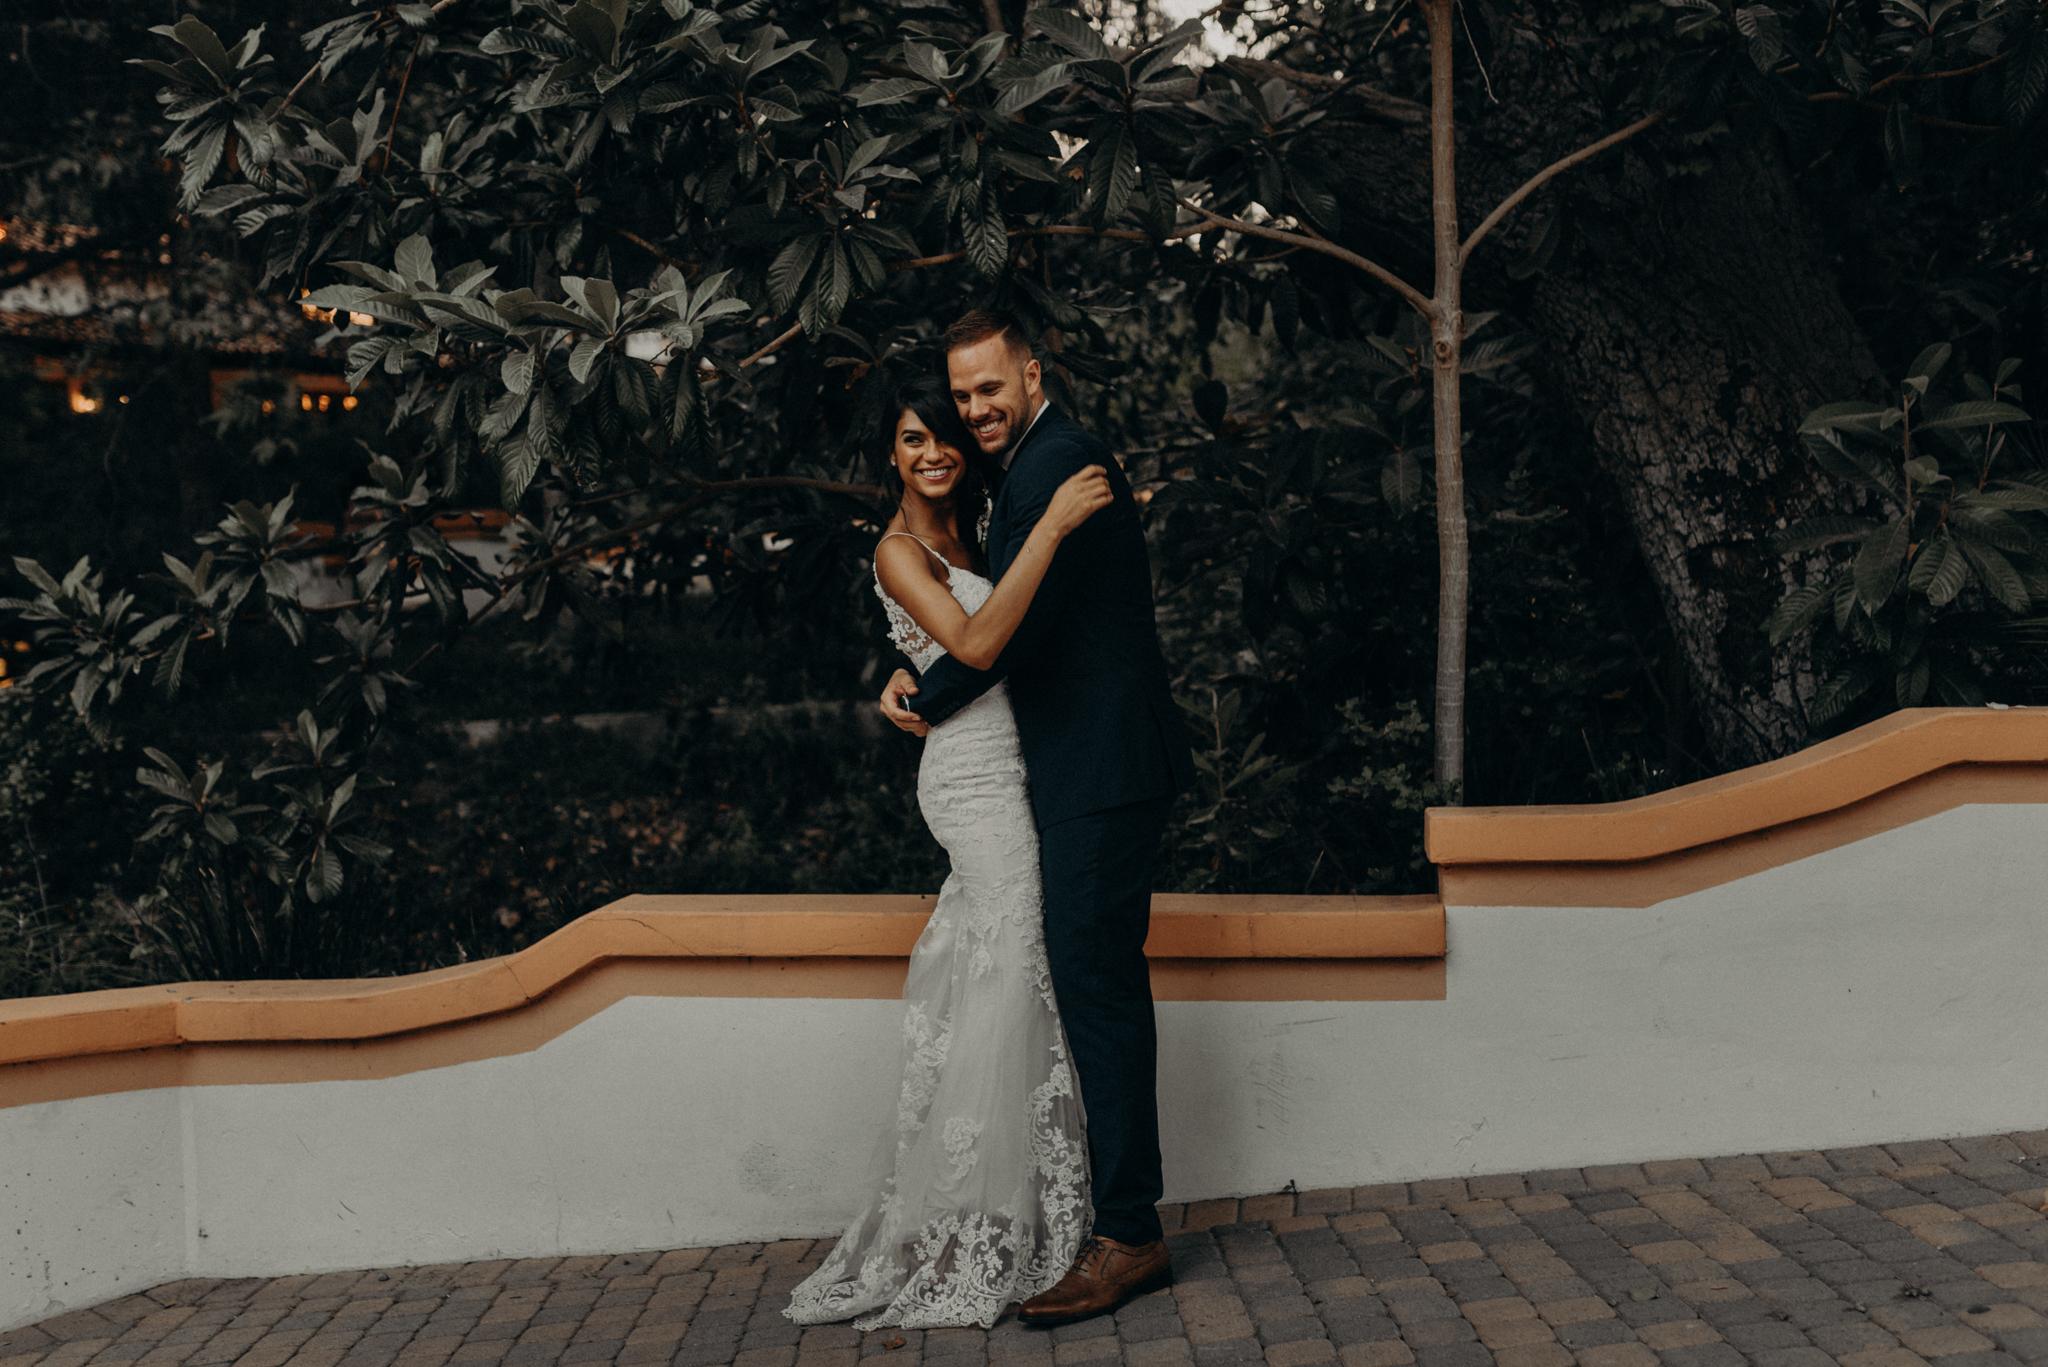 Isaiah + Taylor Photography - Rancho Las Lomas Wedding, Los Angeles Wedding Photographer-133.jpg